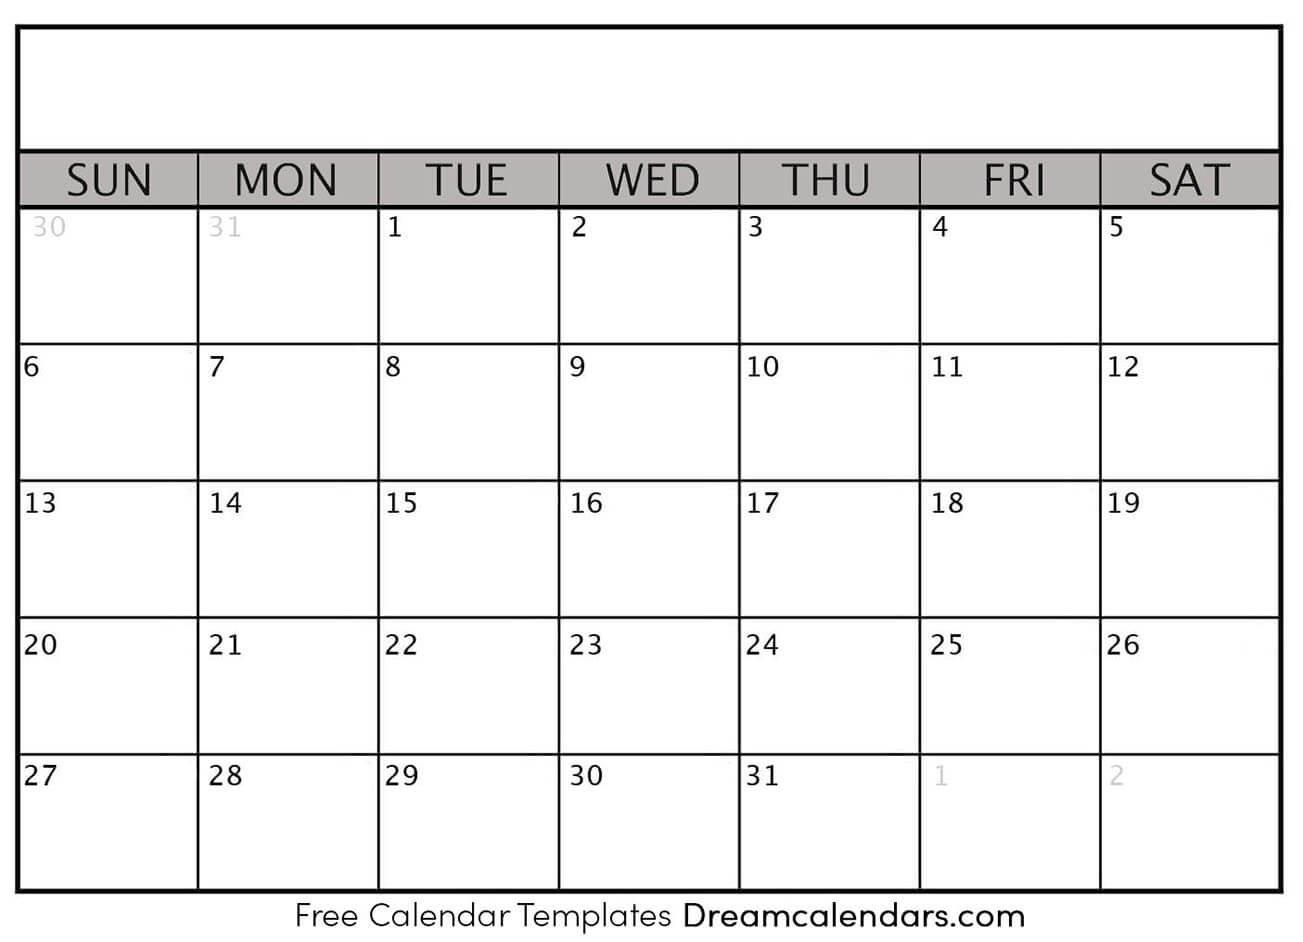 Printable Blank Calendar 2020 | Dream Calendars Free Printable Calendar Fill In